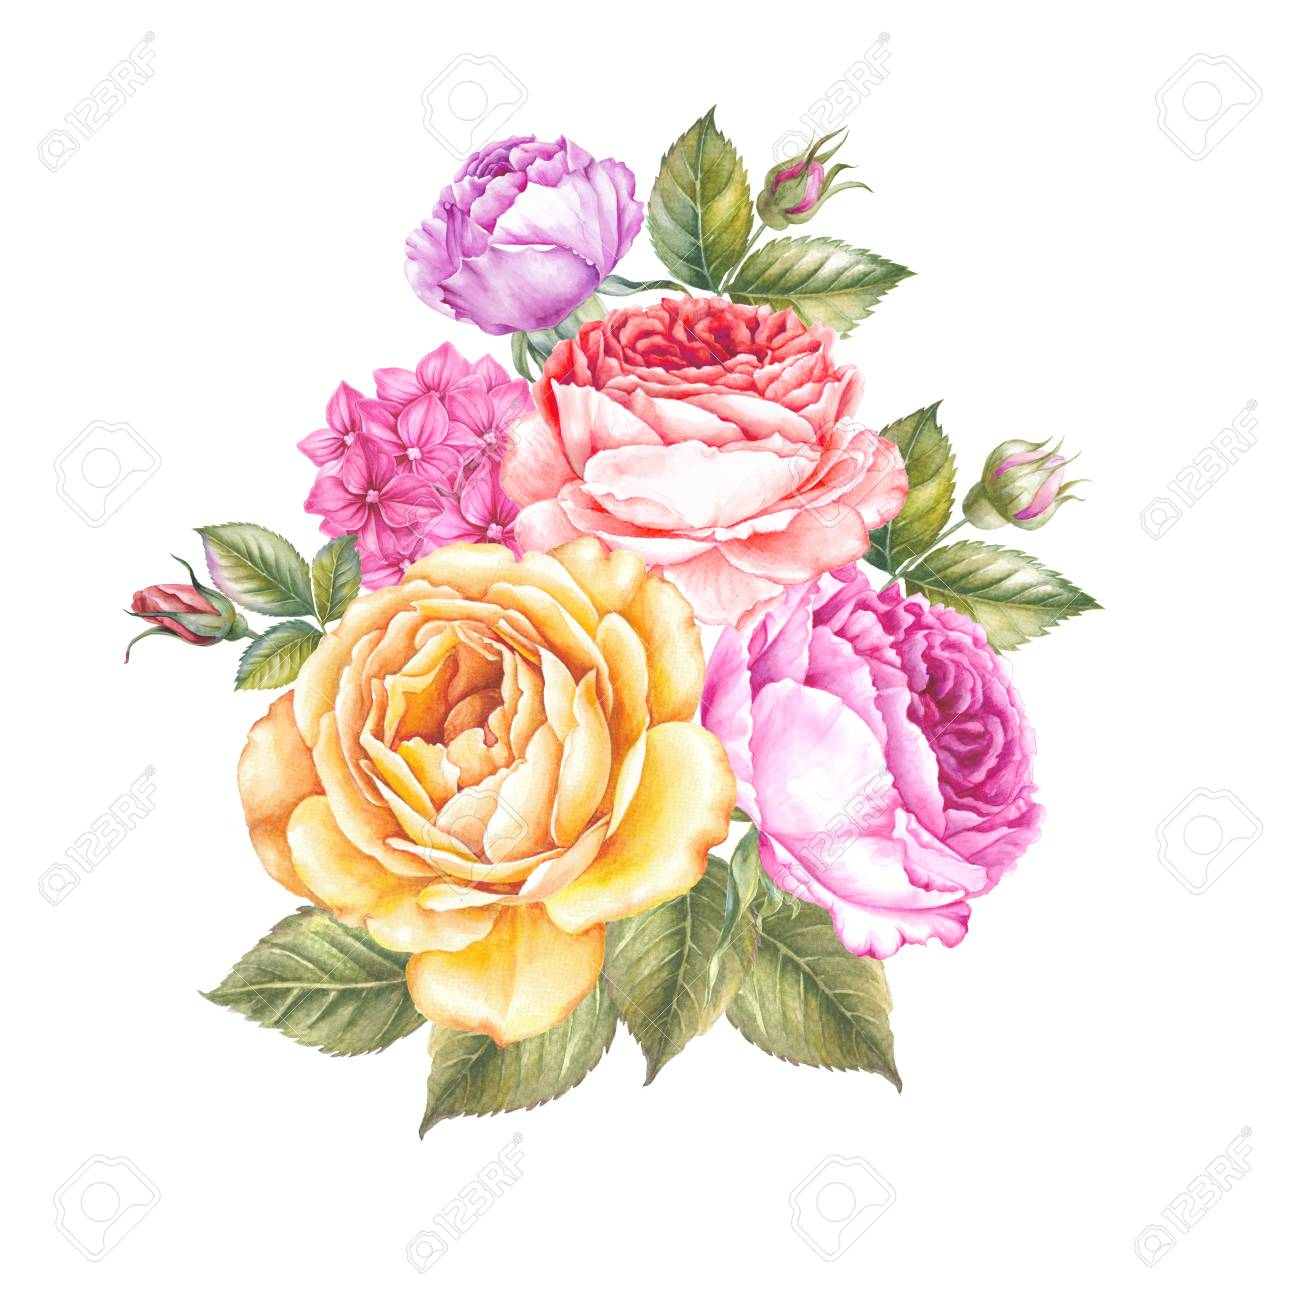 Vintage Garland Of Blooming Roses Watercolor Botanical Illustration